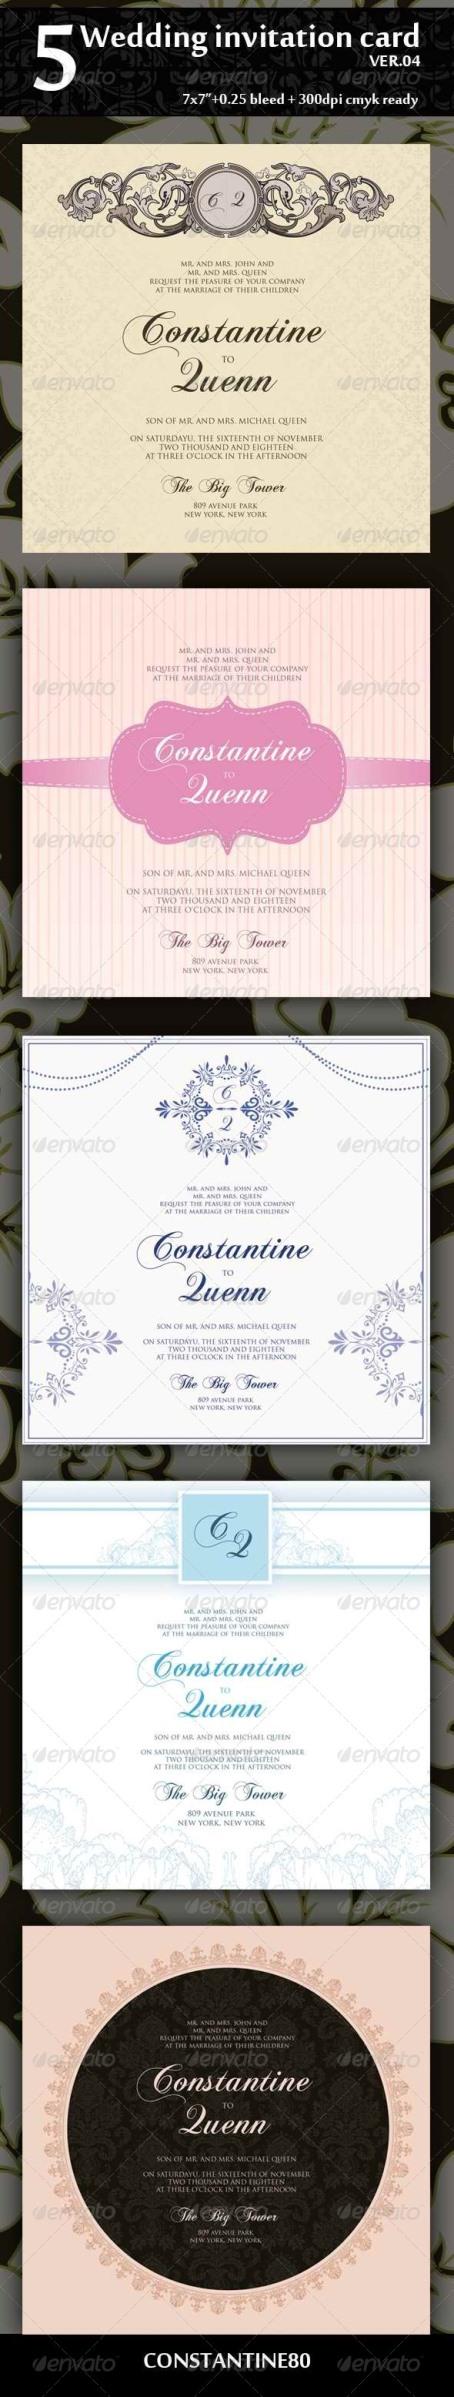 Desain Undangan Pernikahan Terbaik Template Photoshop Desain Undangan Nikah 5 Wedding Invitation 7 7 Ver 04 Undangan Pernikahan Template Desain Undangan